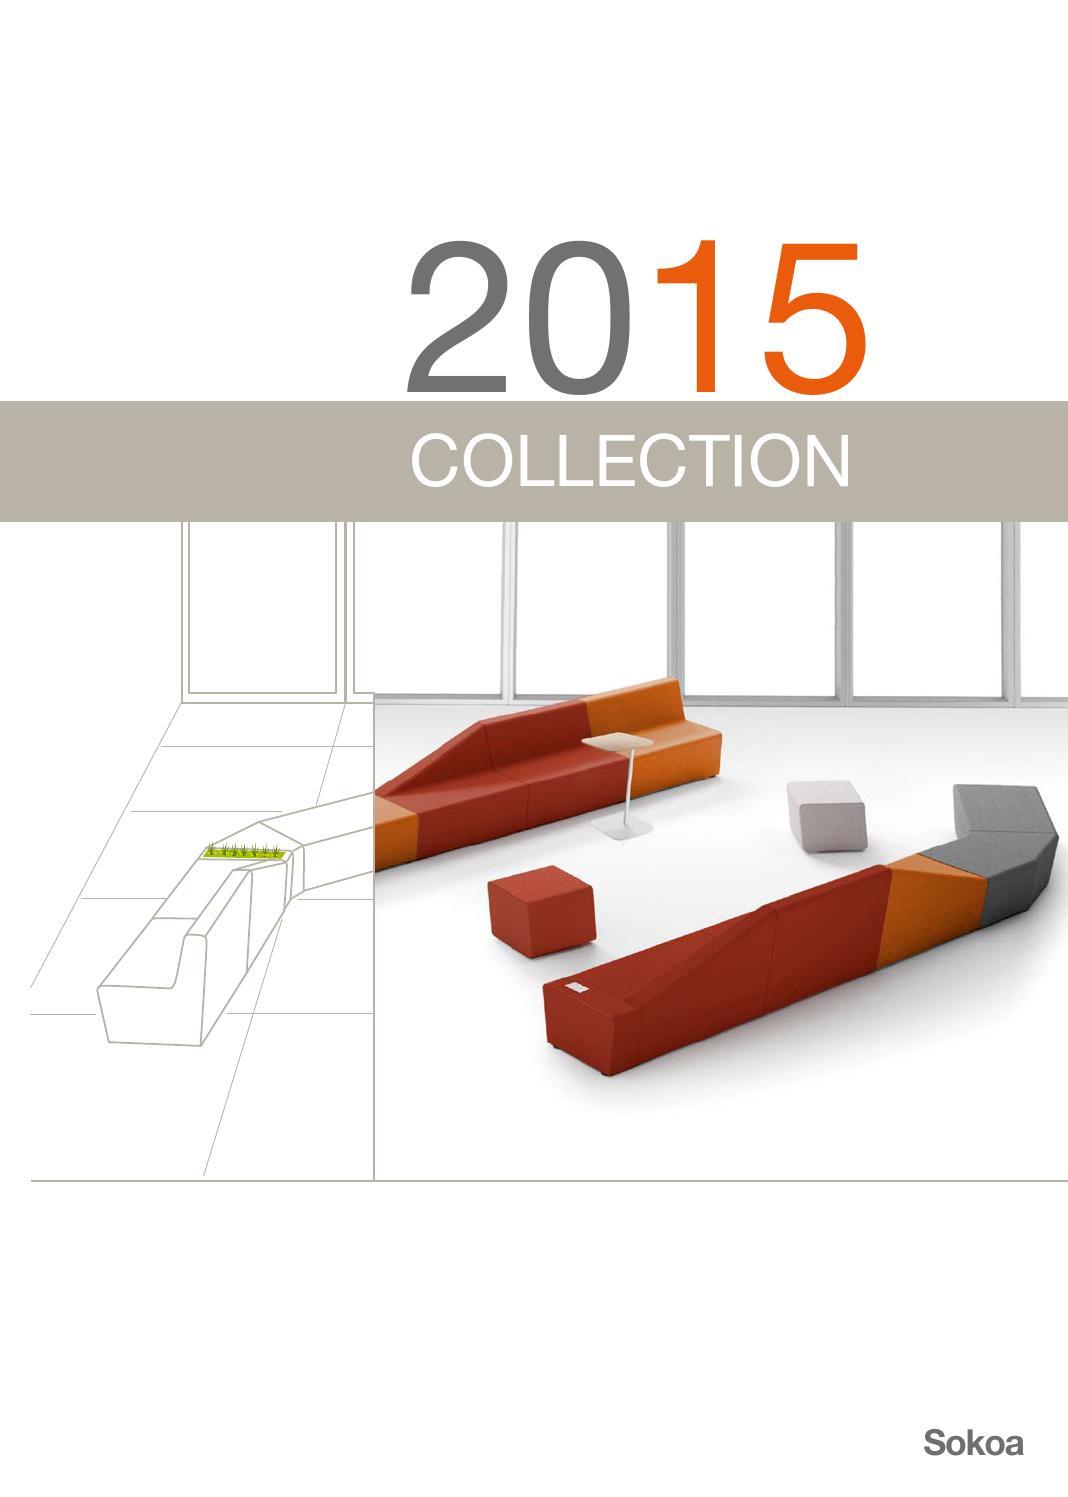 catalogue collection sokoa 2015 by sokoa hendaye issuu. Black Bedroom Furniture Sets. Home Design Ideas